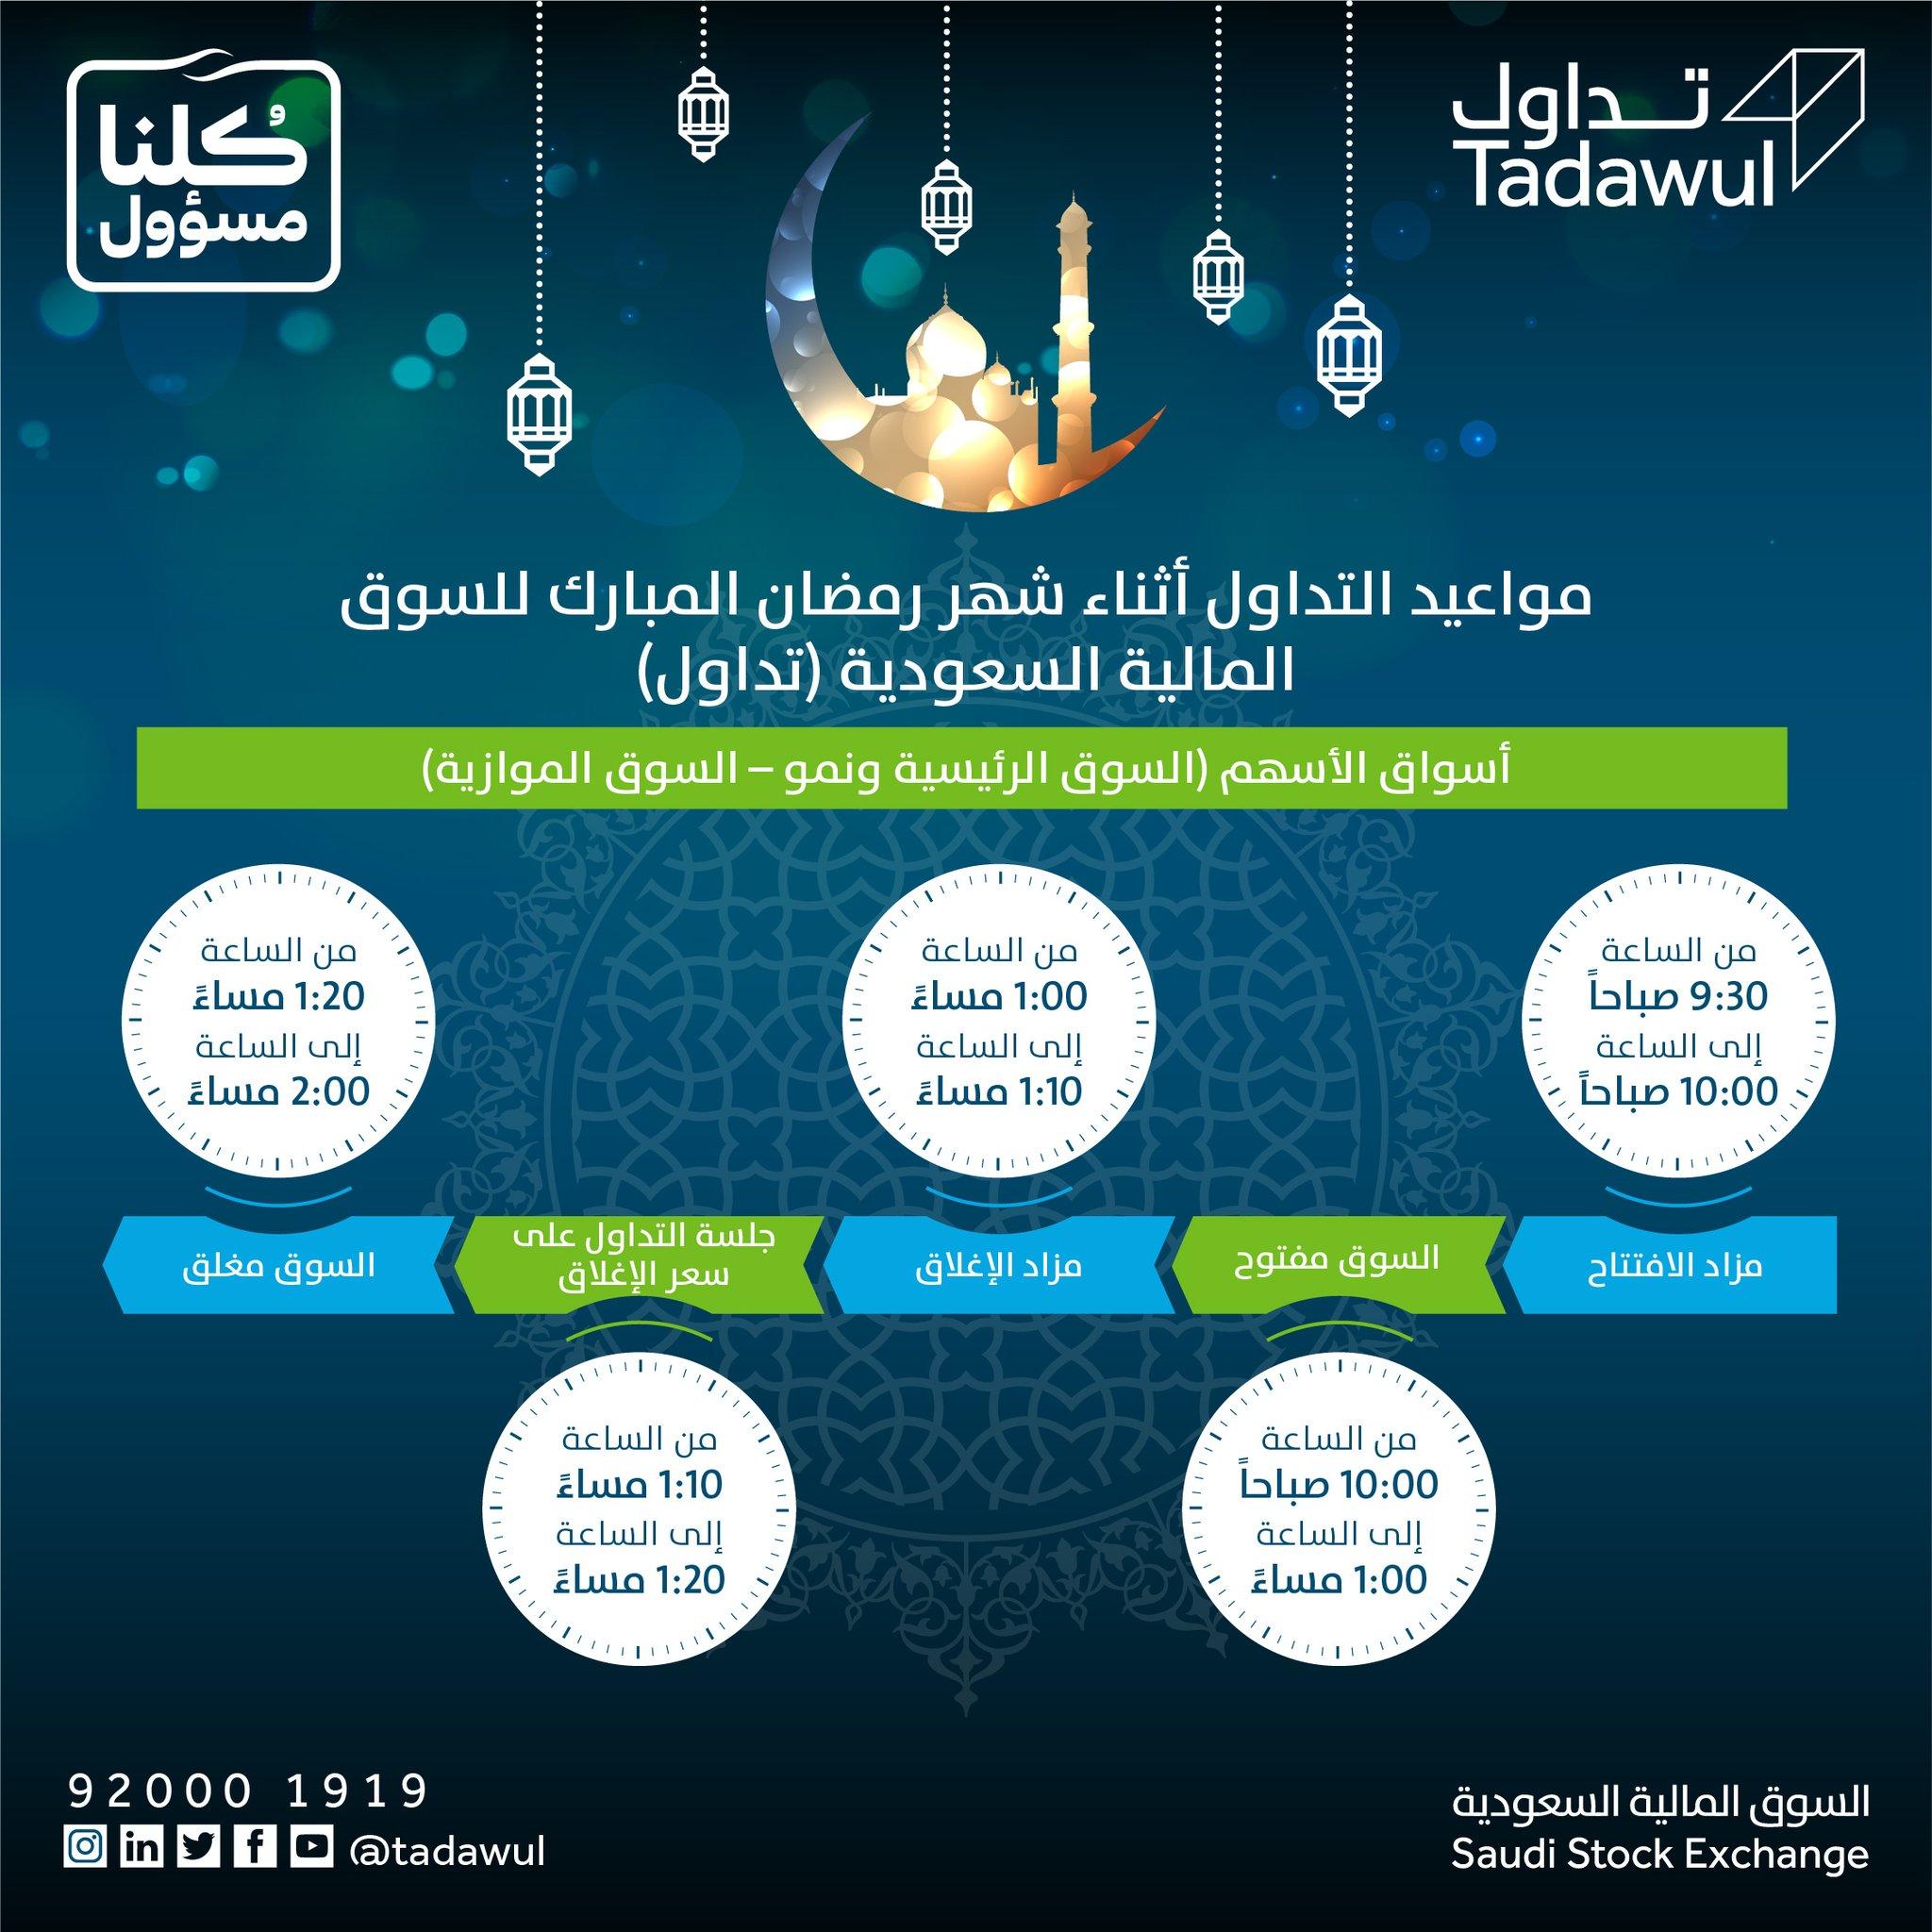 Twitter पर Tadawul تداول مواعيد التداول أثناء شهر رمضان المبارك للـسوق المالية السعودية تداول رمضان مبارك